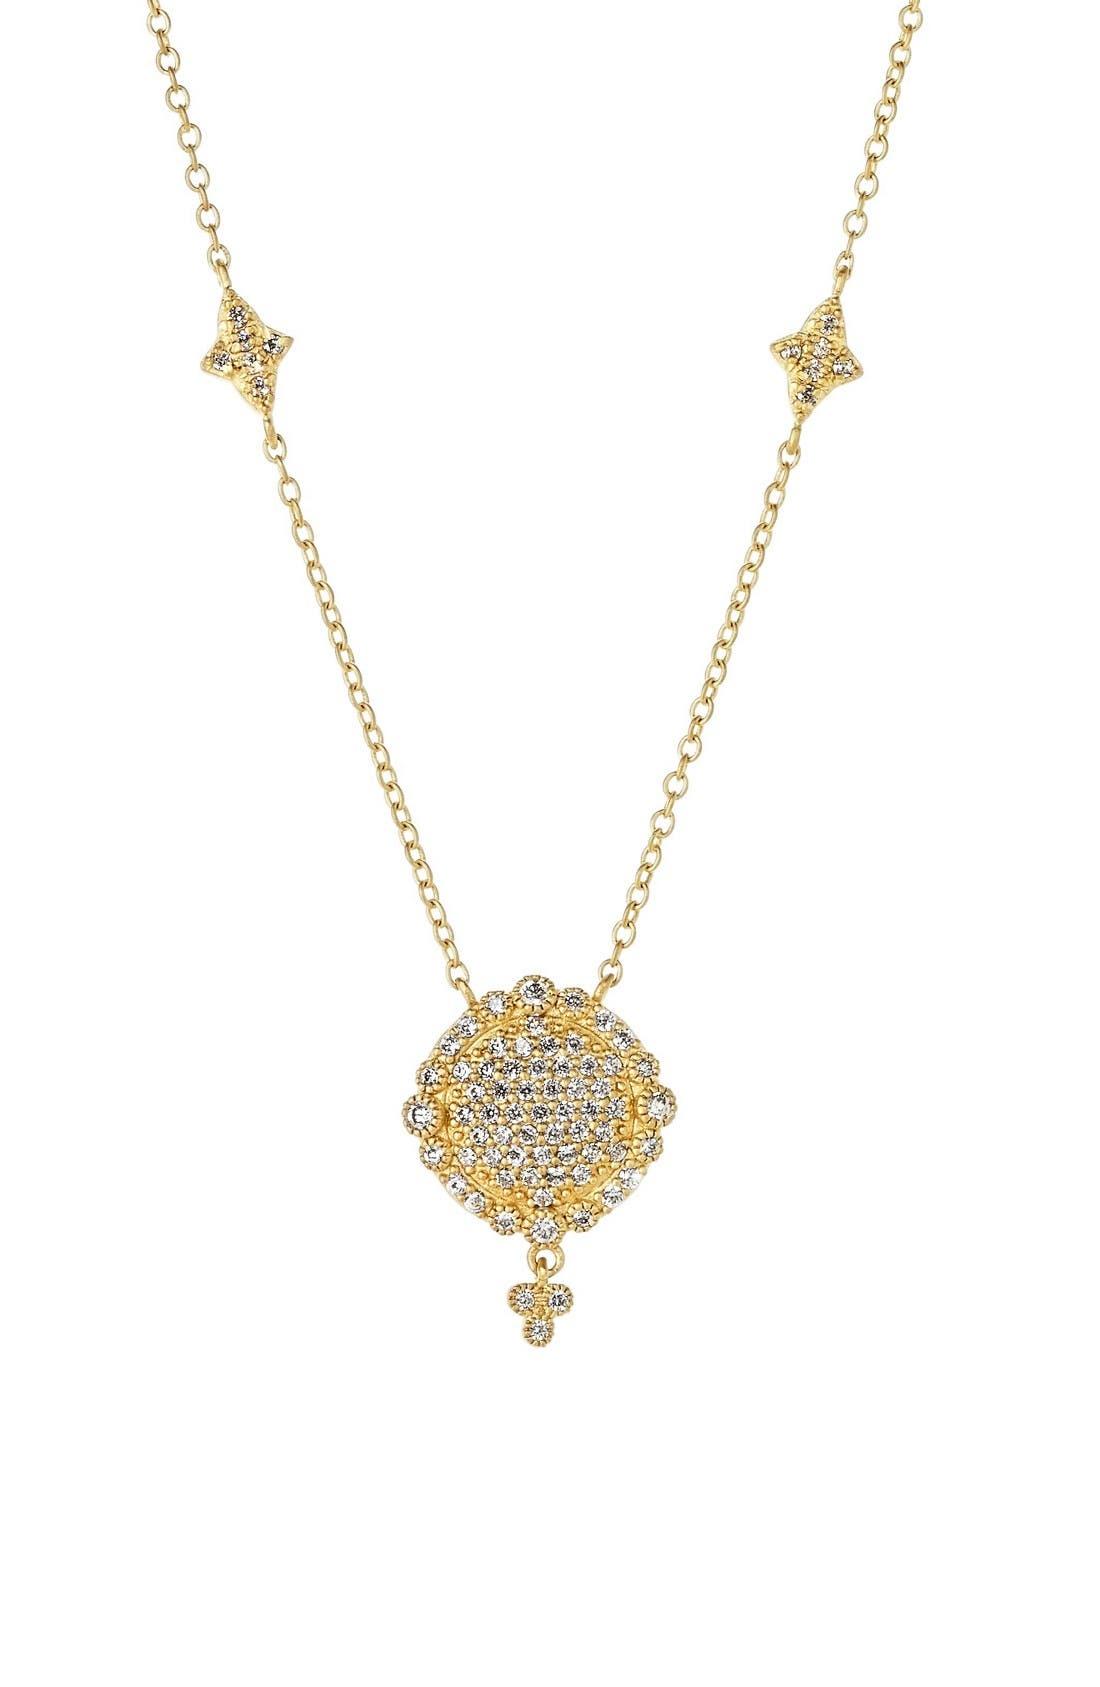 Alternate Image 1 Selected - FREIDA ROTHMAN 'Mercer' Pavé Pendant Necklace